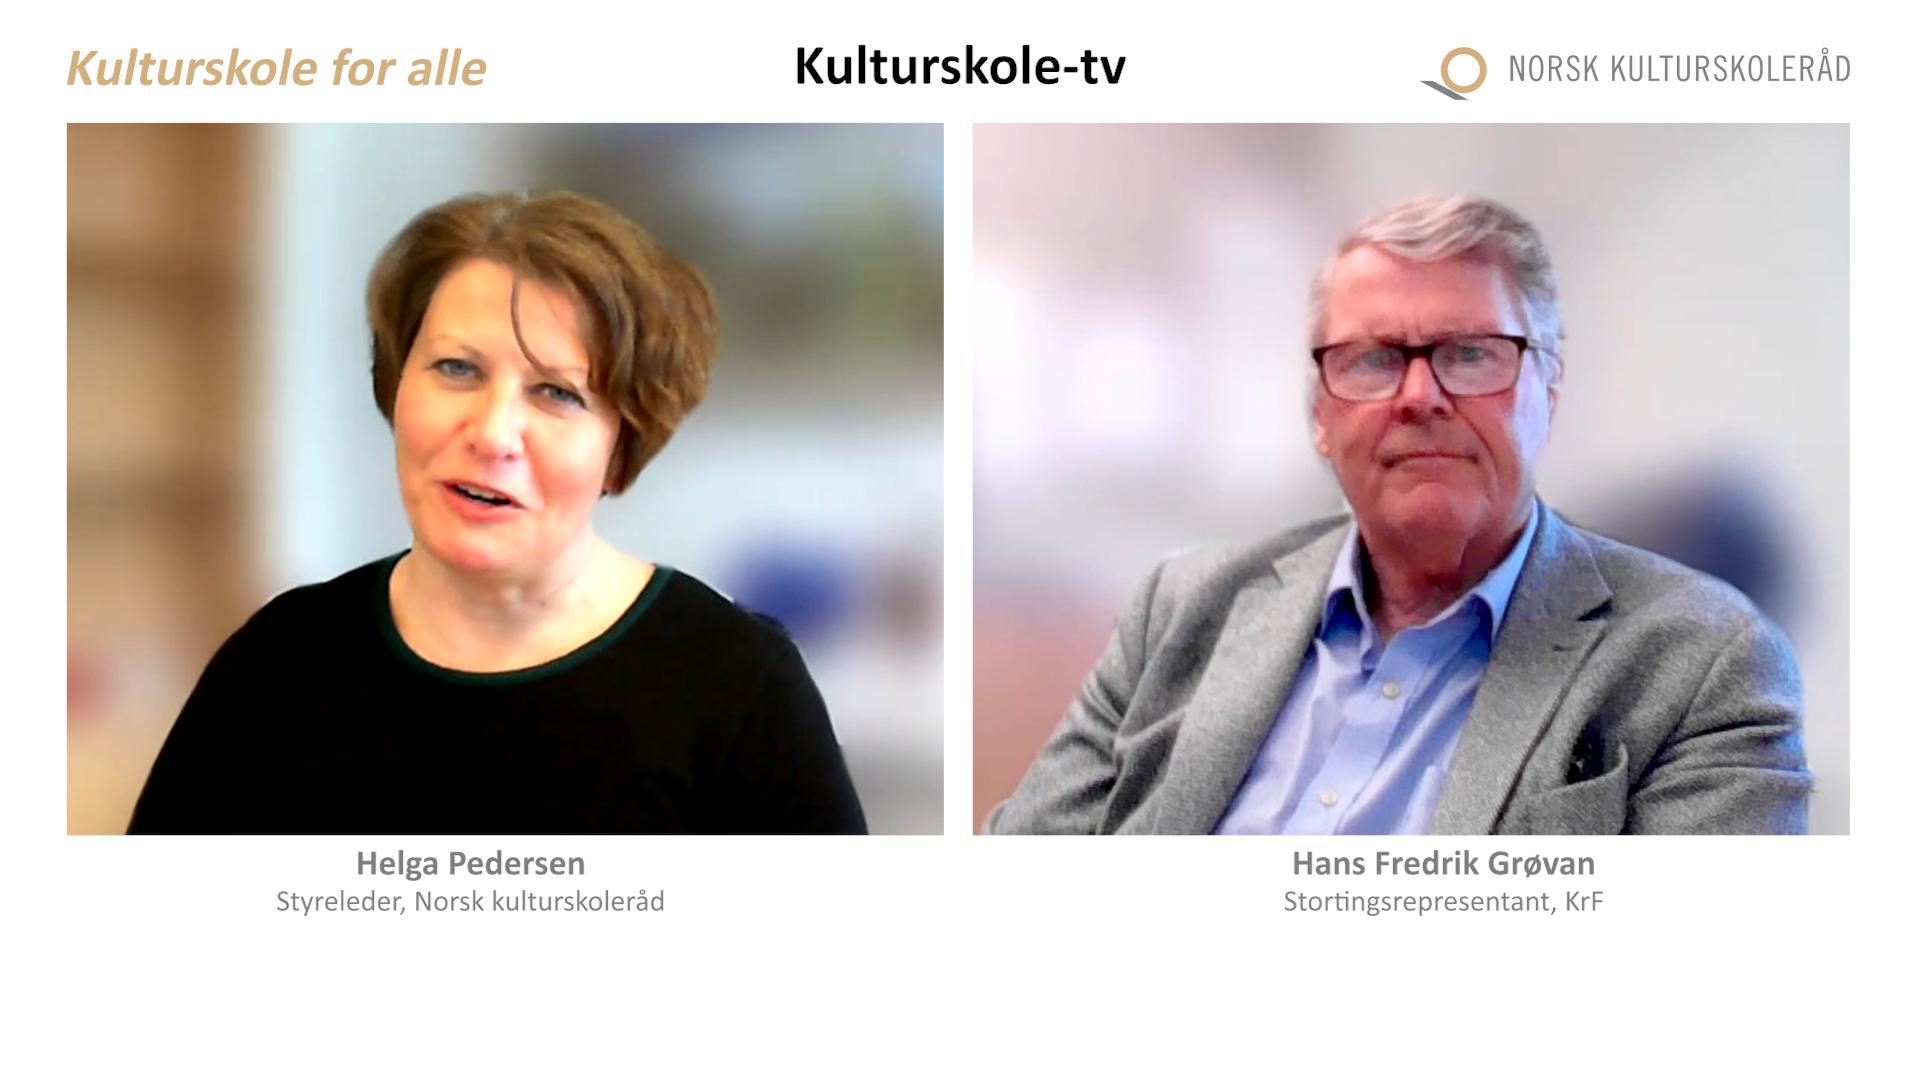 2o21 Kulturskole-tv Grøvan 20.5.png